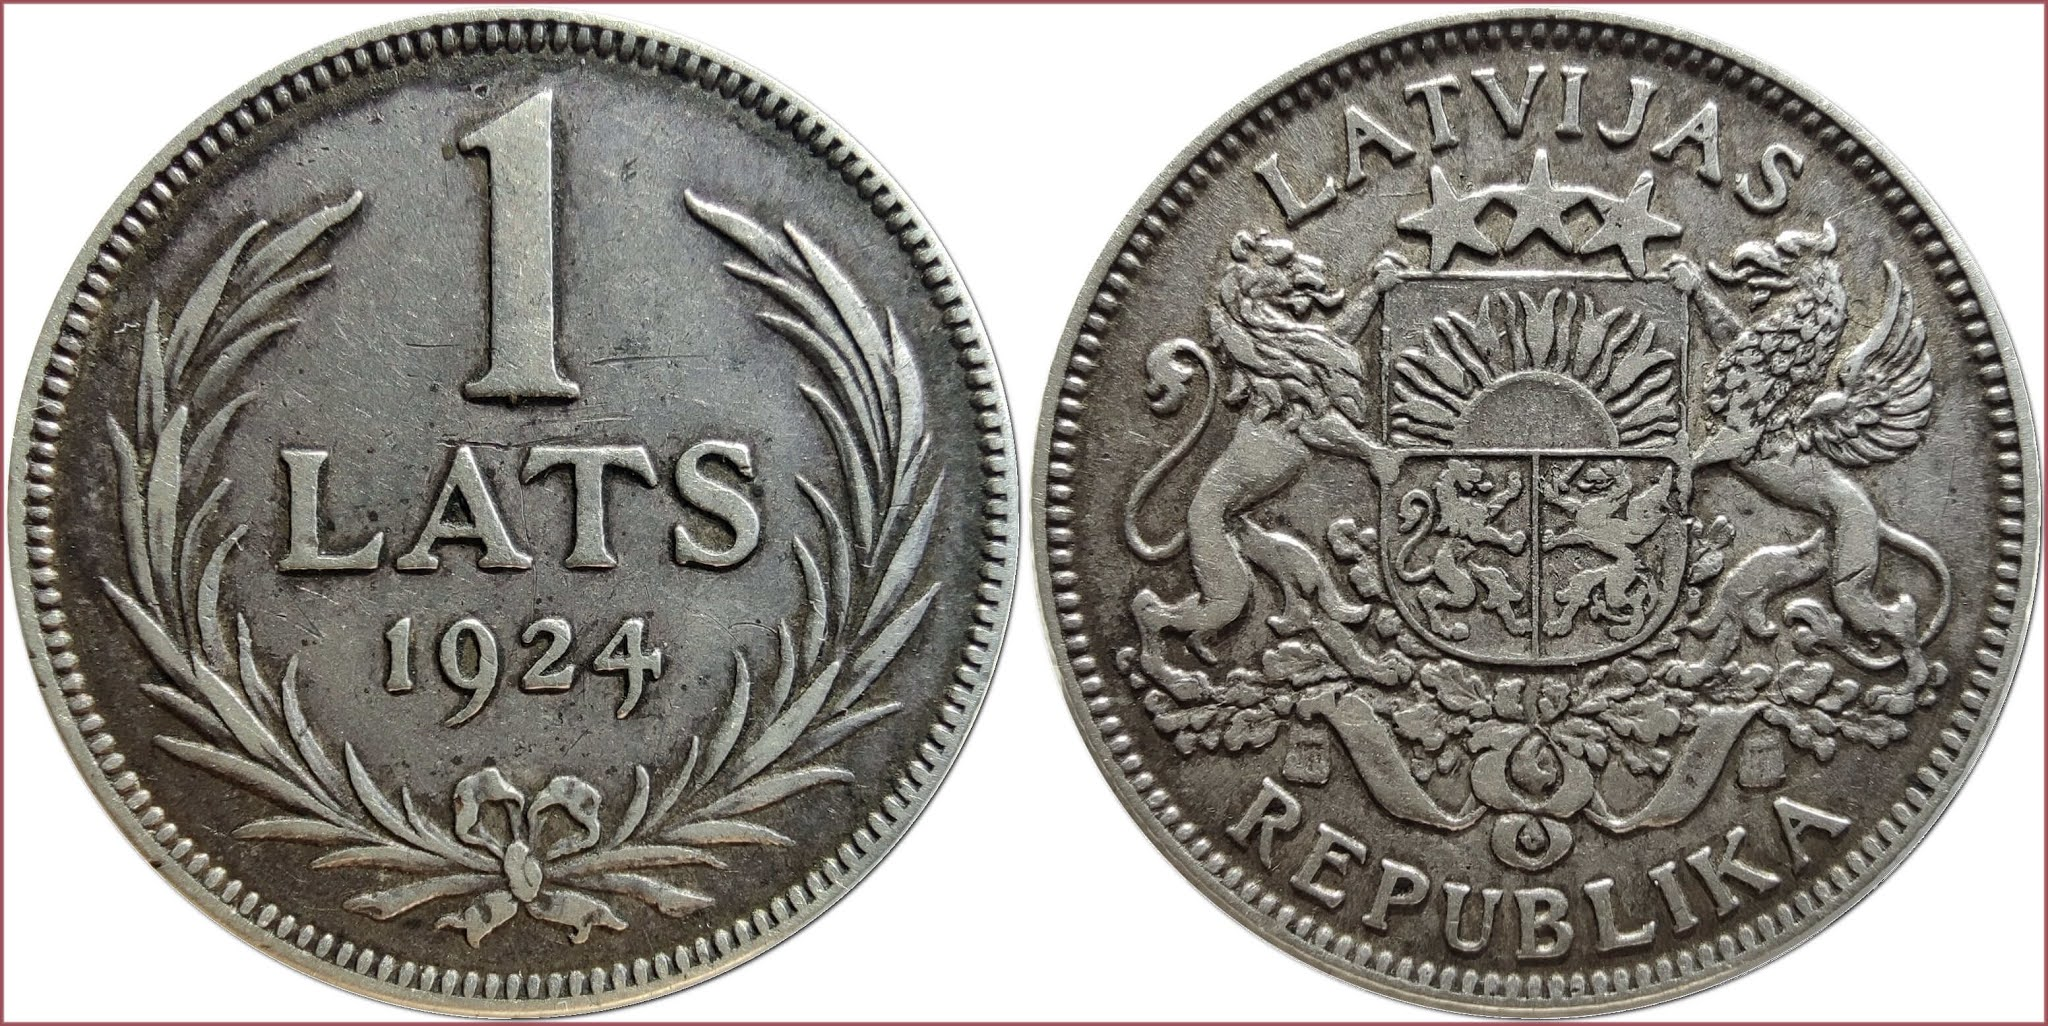 1 lats, 1924: Republic of Latvia